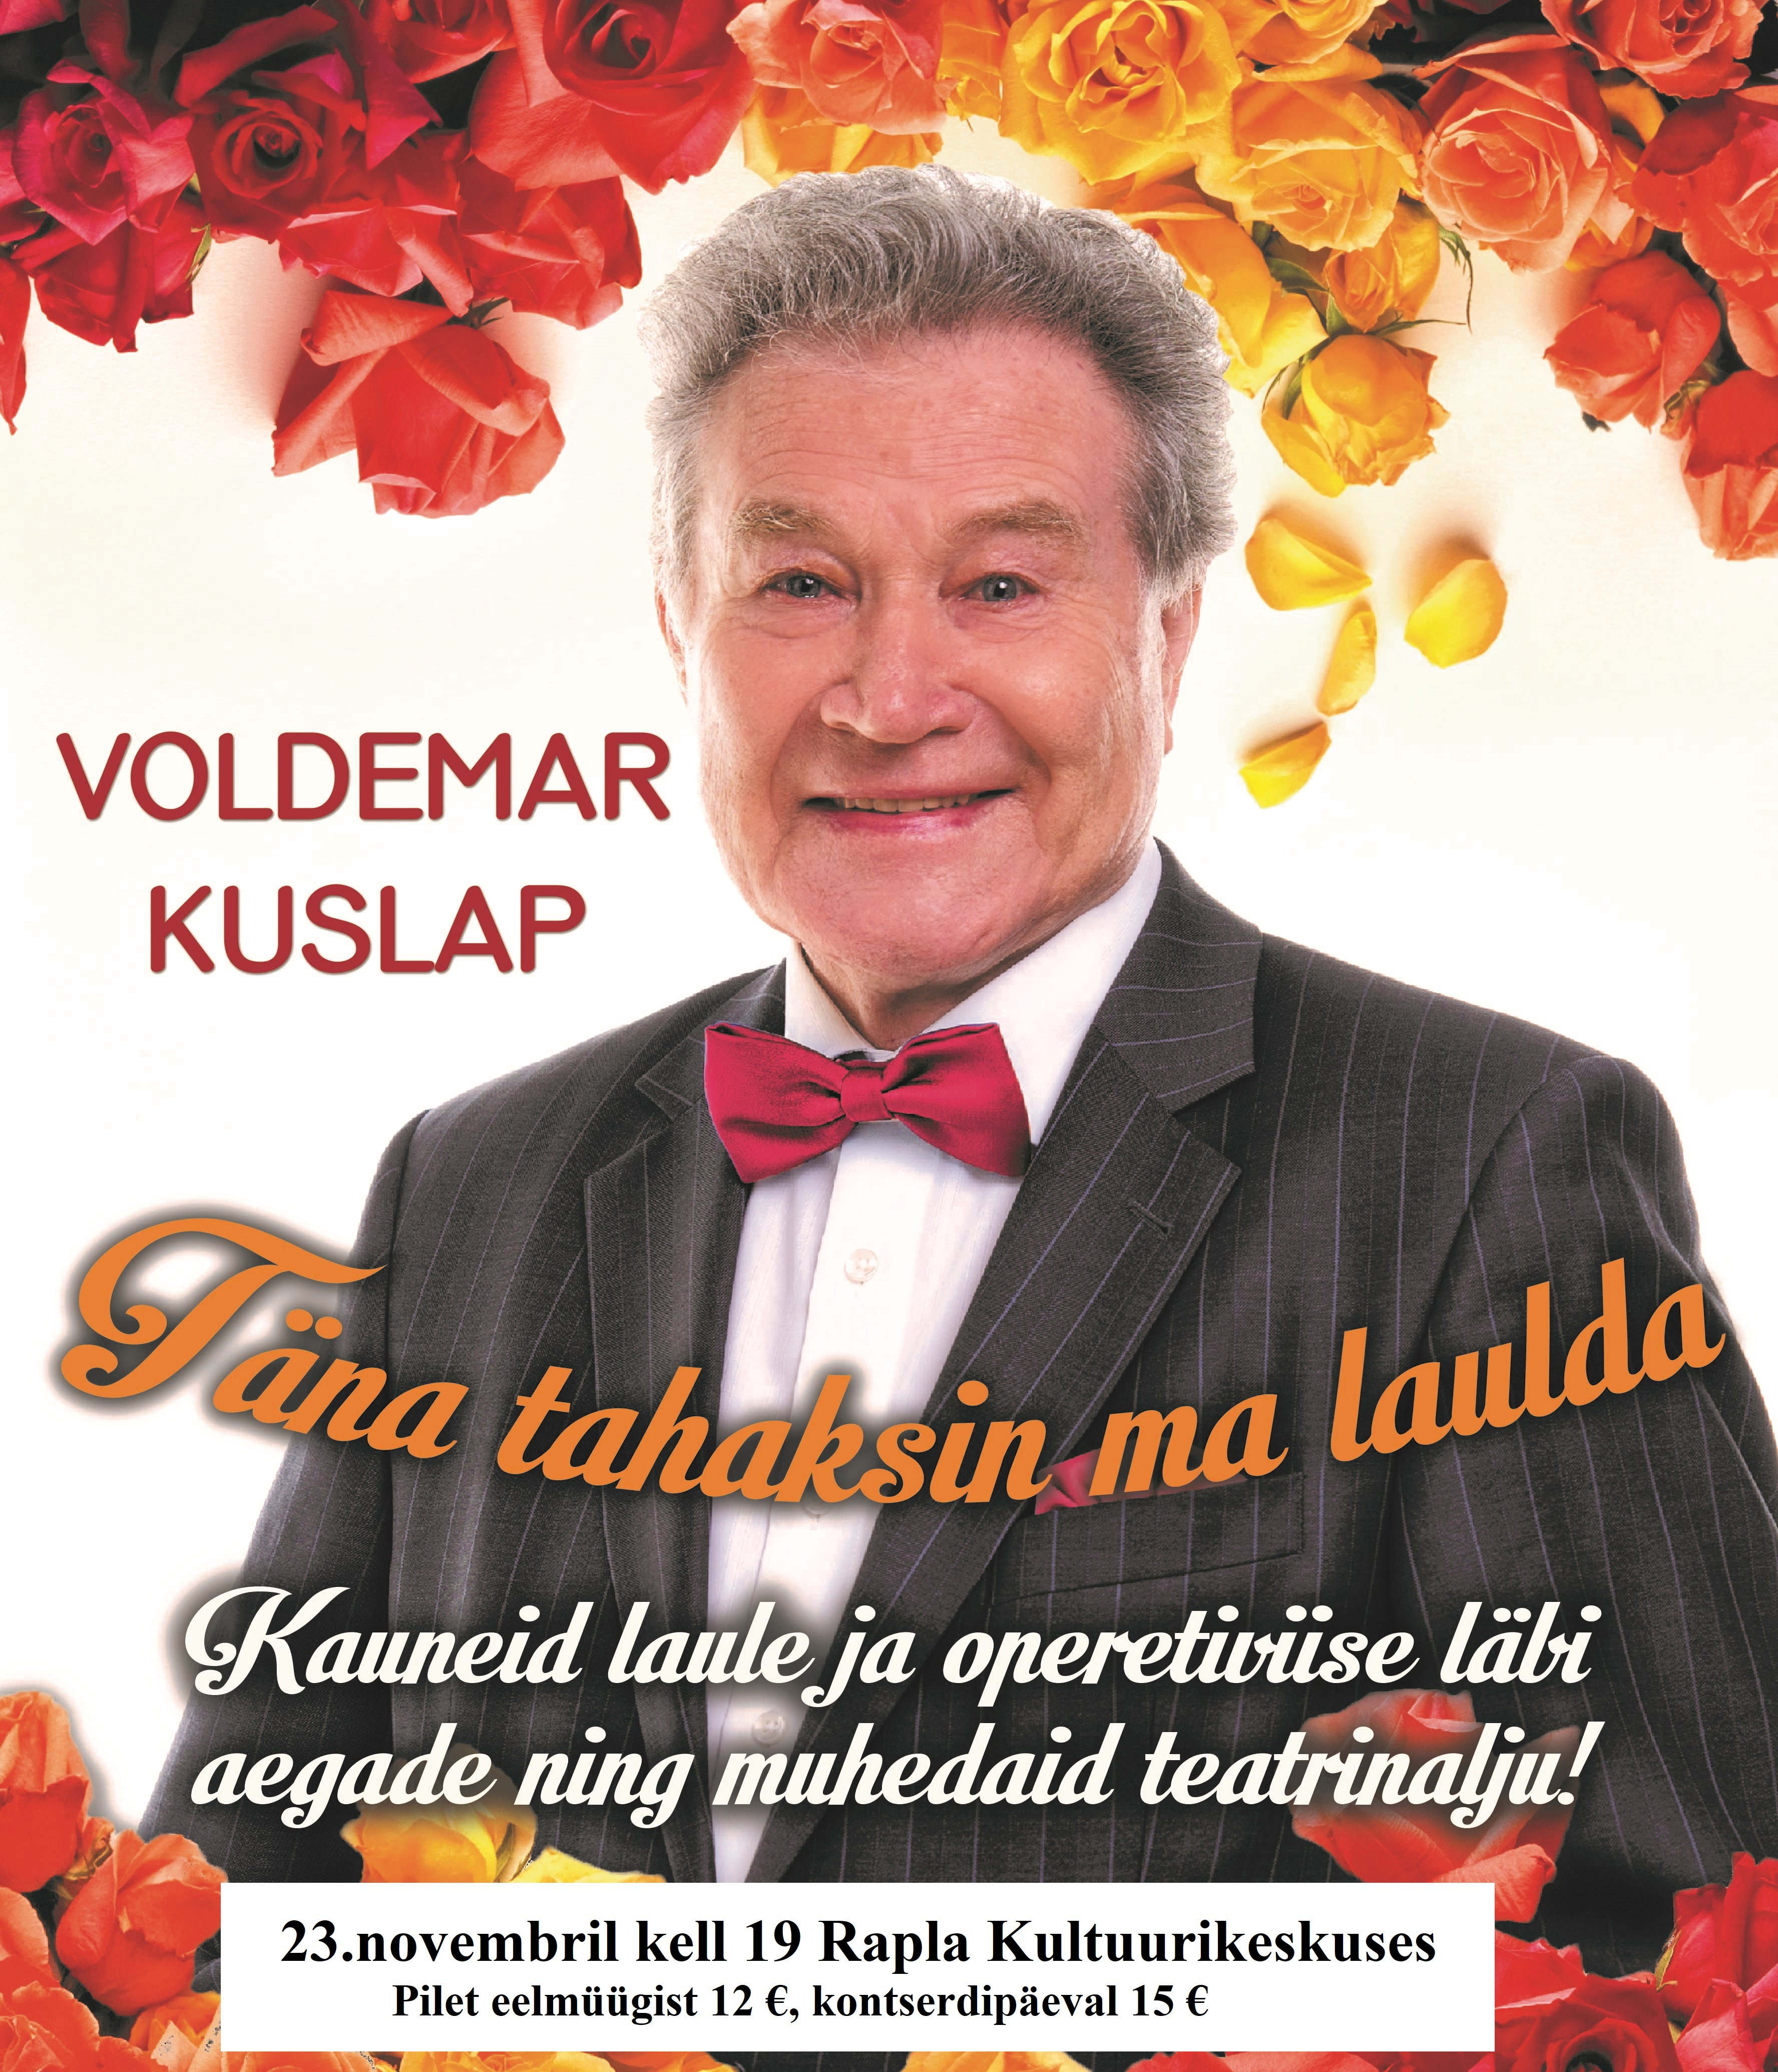 Voldemar Kuslap 80